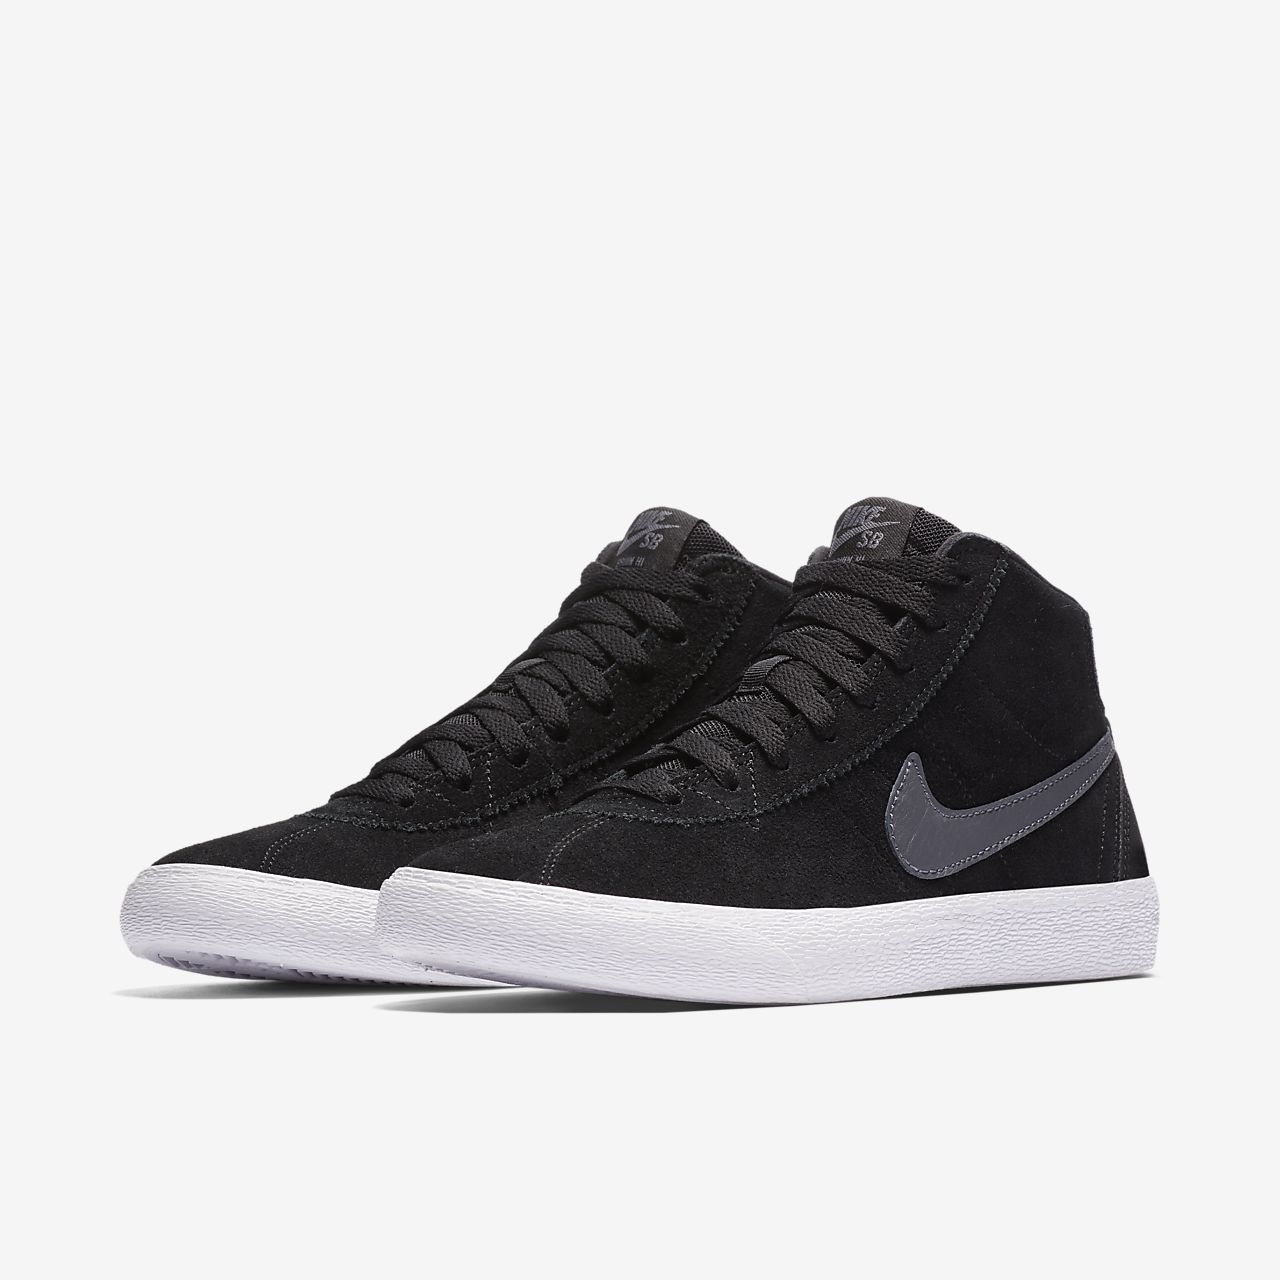 SB Women's Bruin Hi Shoe 923112 - Black/Dark Grey-White US 9.5